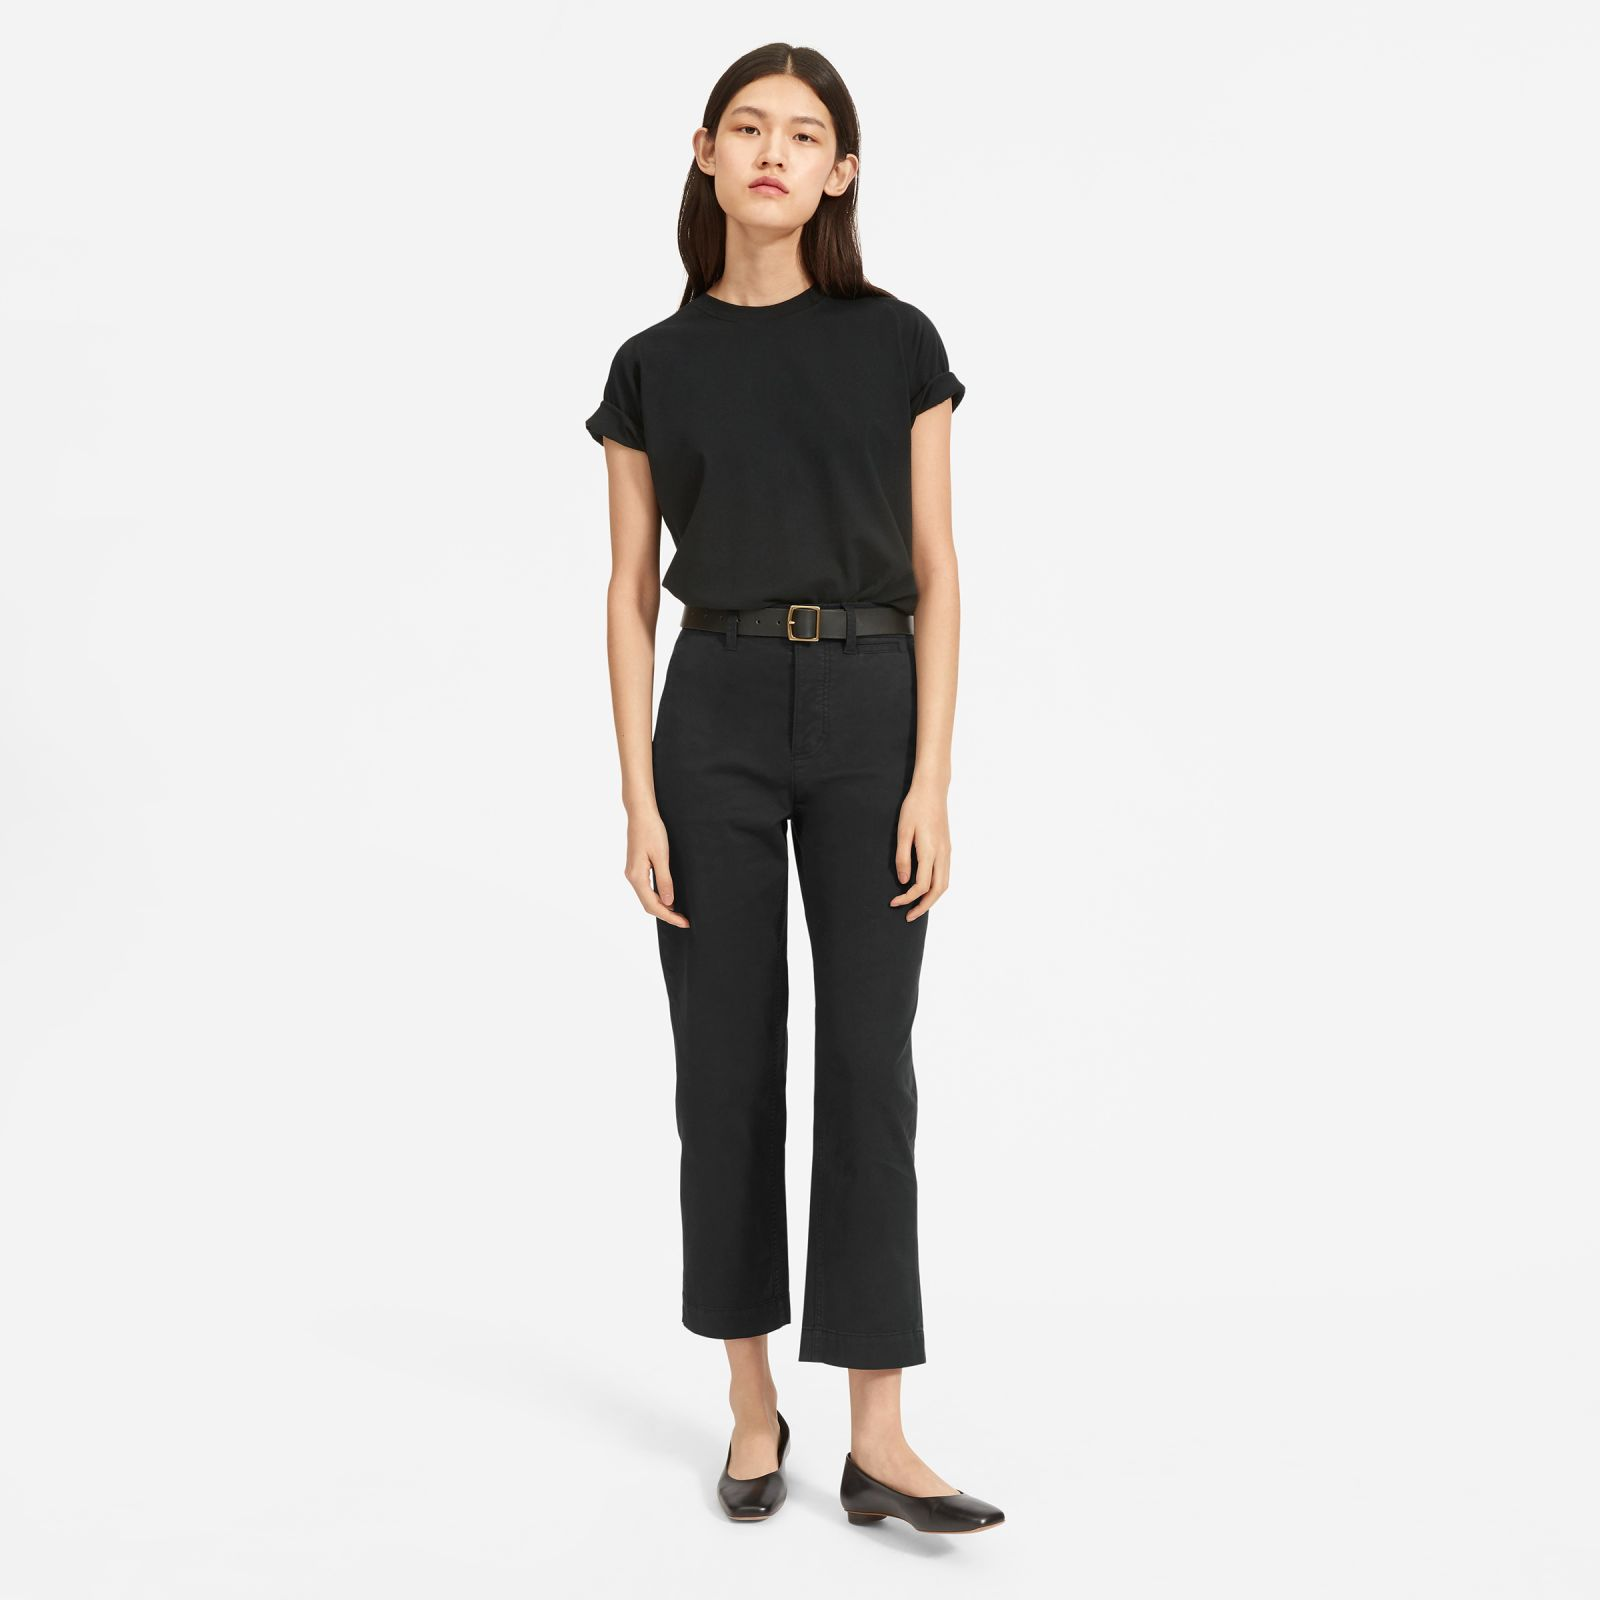 women's easy raglan t-shirt by everlane in black, size xl